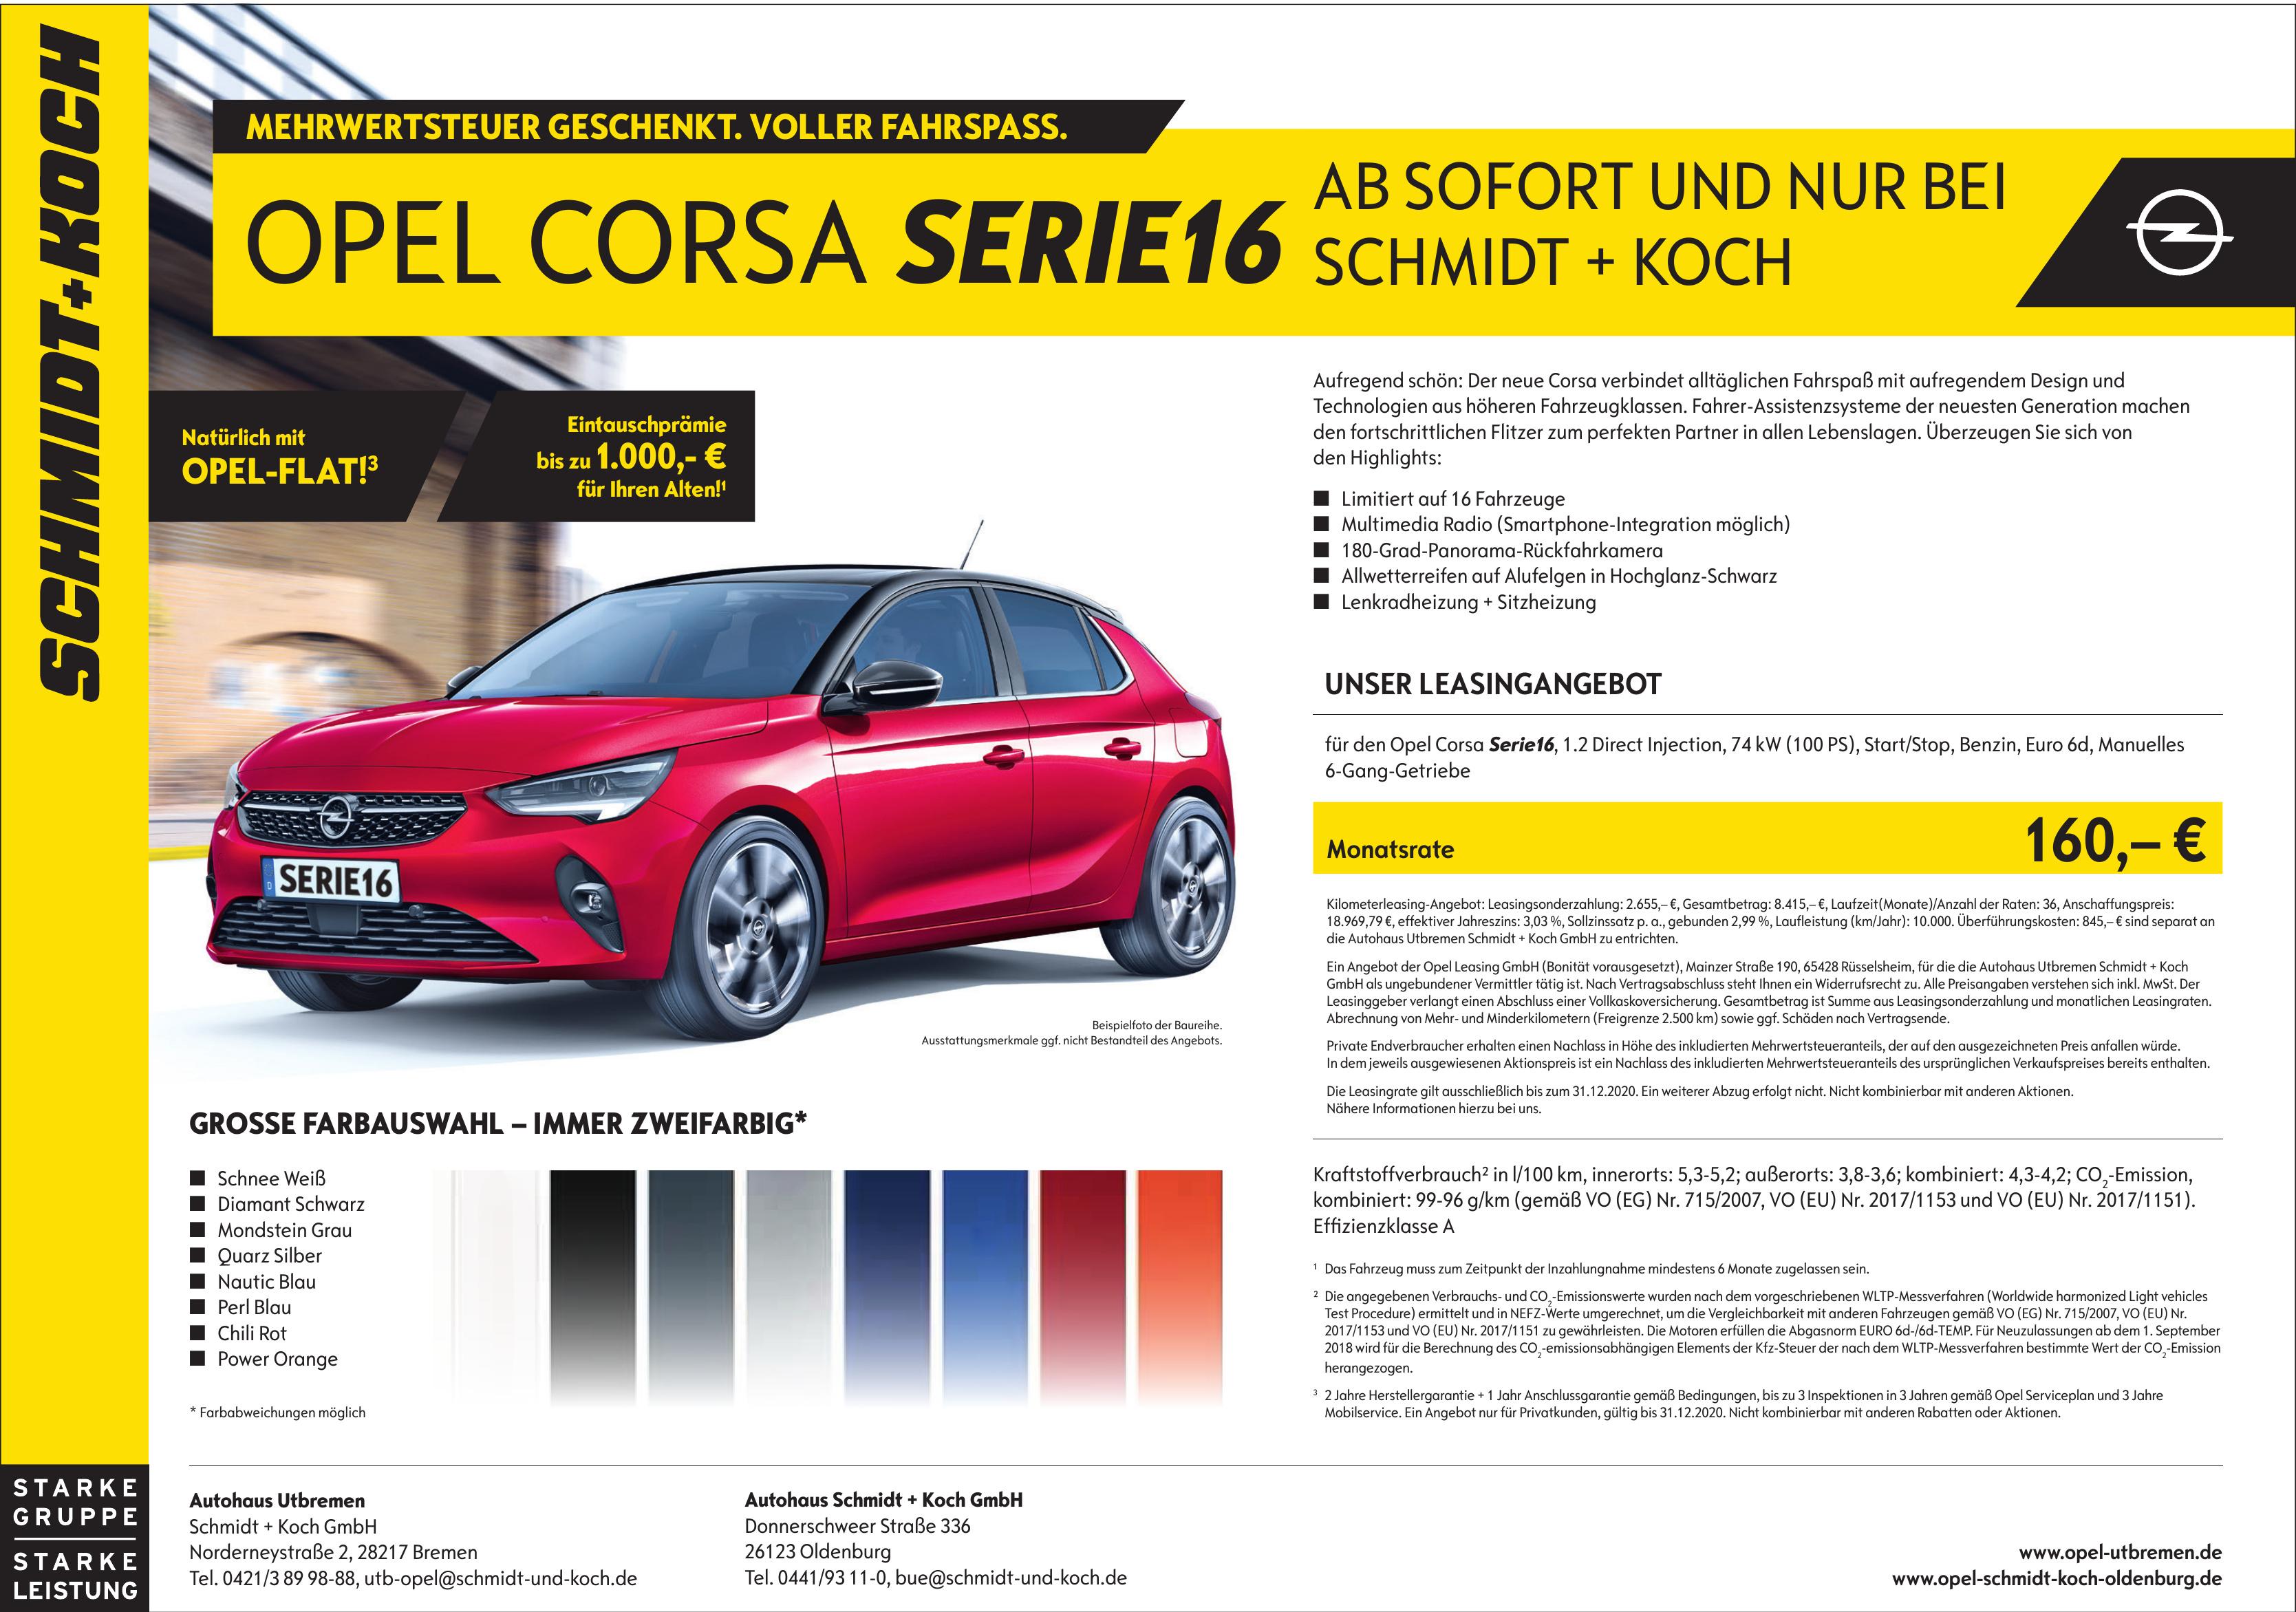 Autohaus Utbremen - Schmidt + Koch GmbH